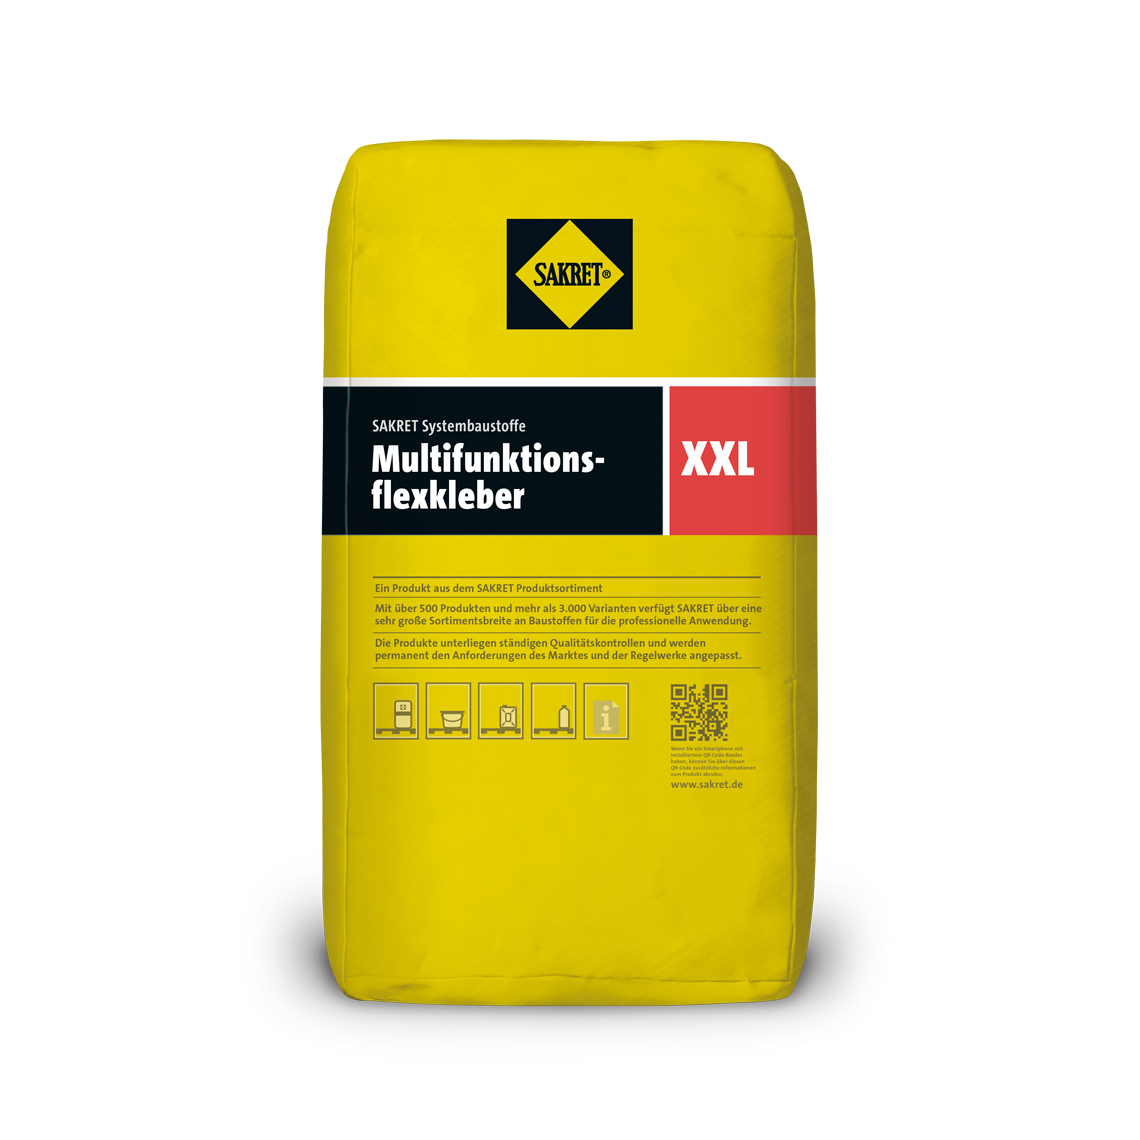 Abbildung SAKRET Multifunktionsflexkleber XXL